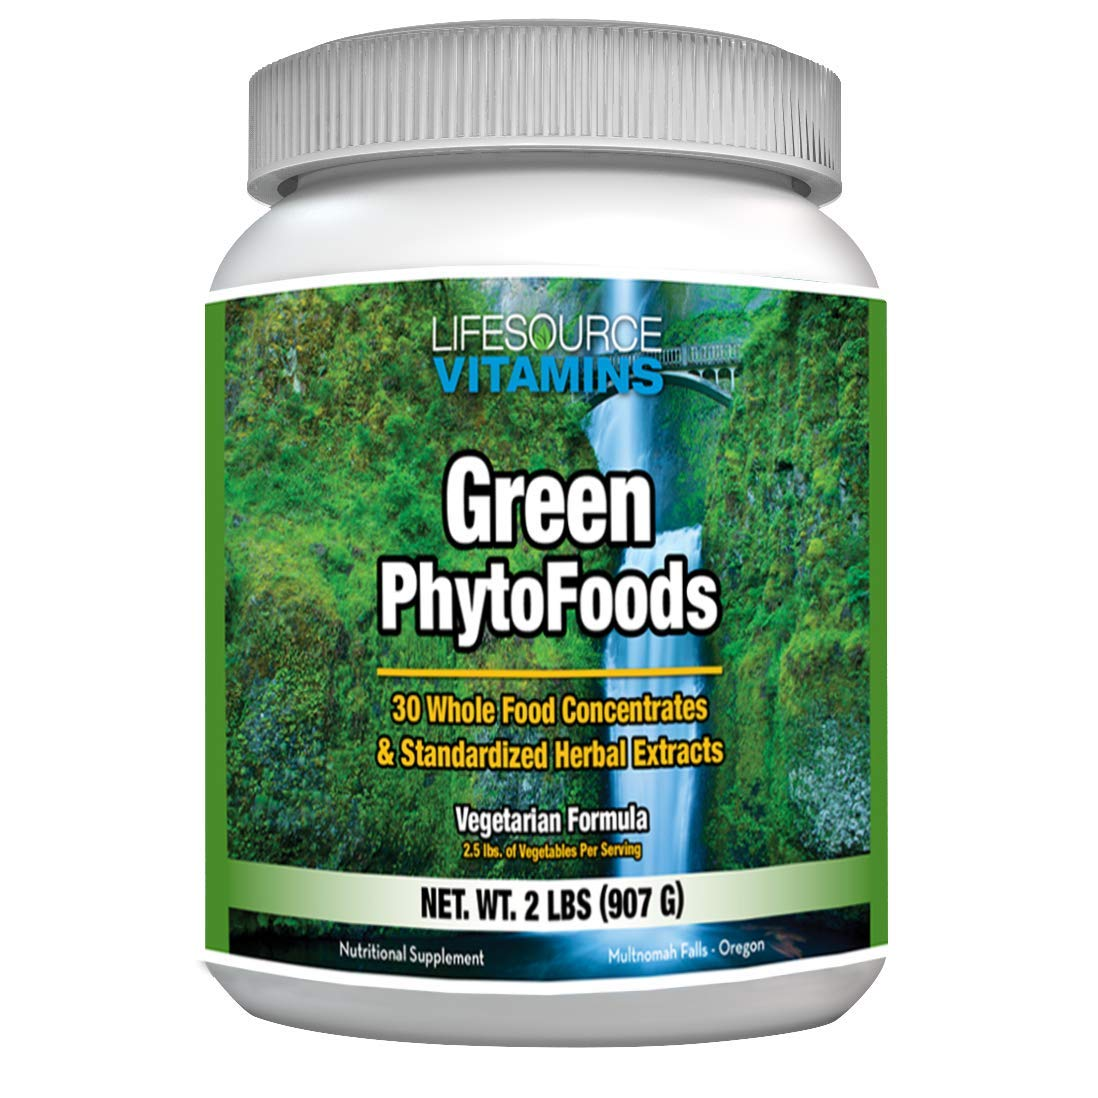 LifeSource Vitamins Green Phyto Foods 2 lb Powder